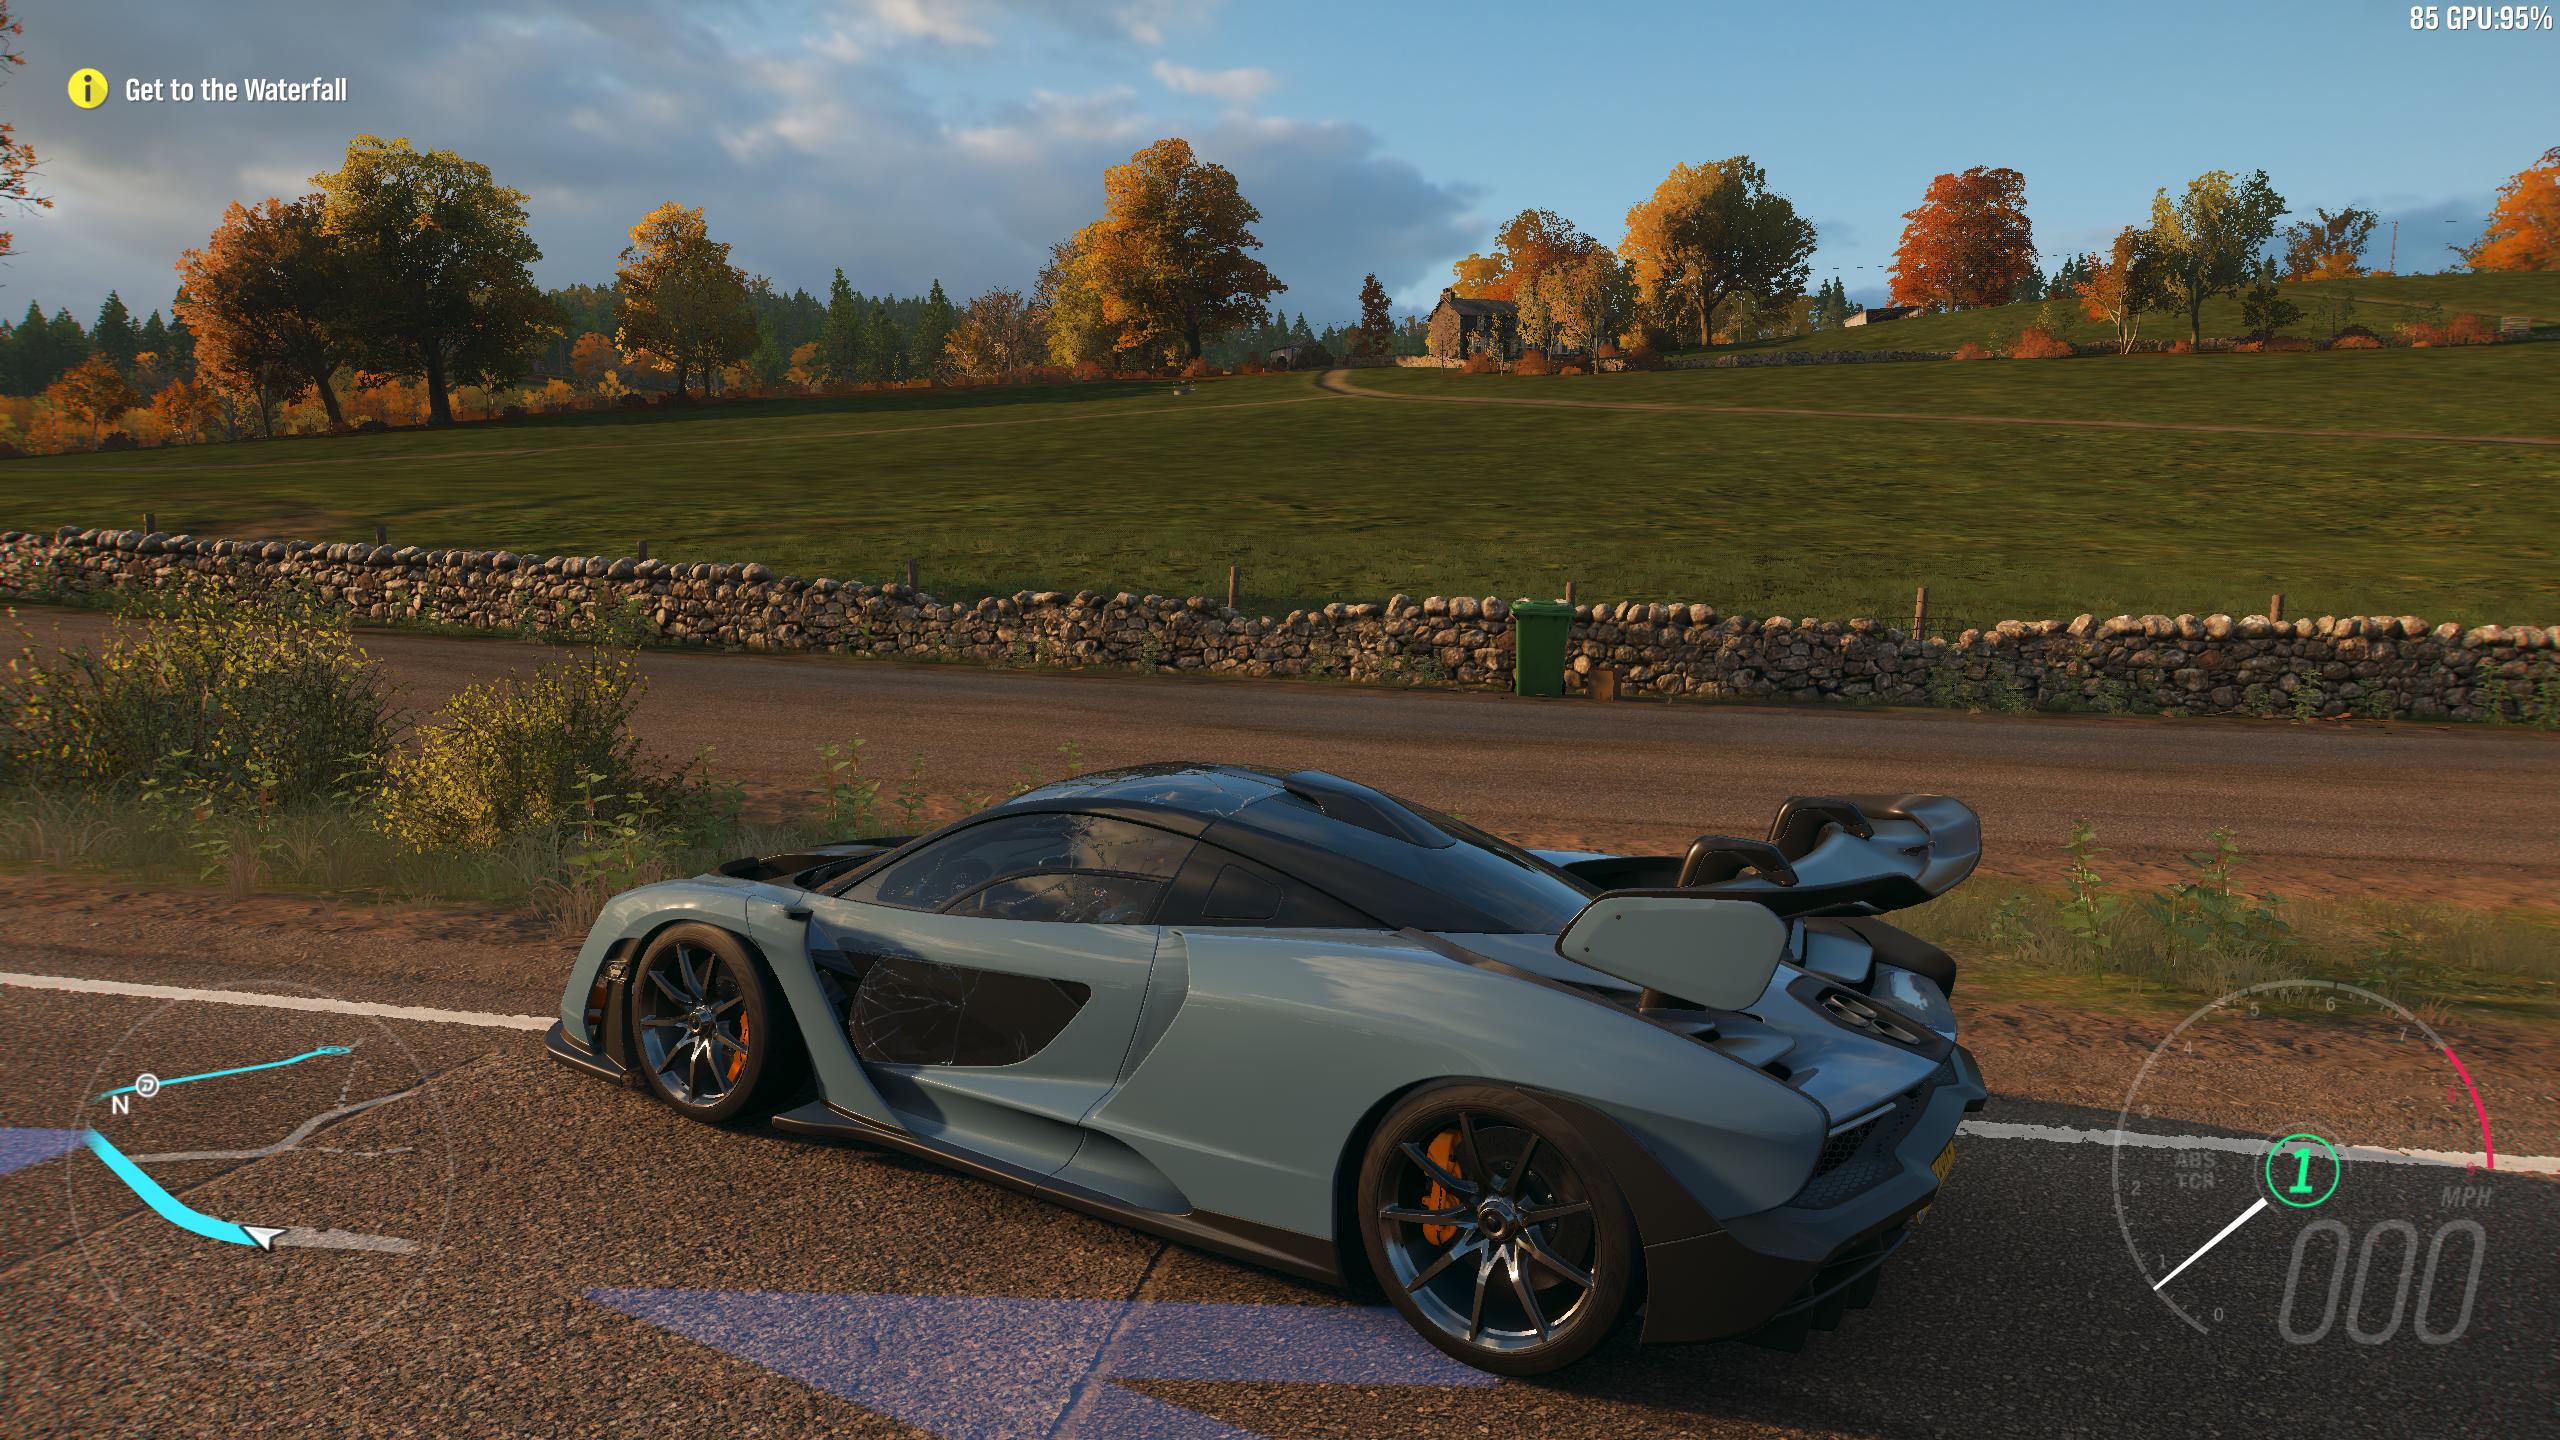 Forza Horizon 4 PC Performance Thread | ResetEra